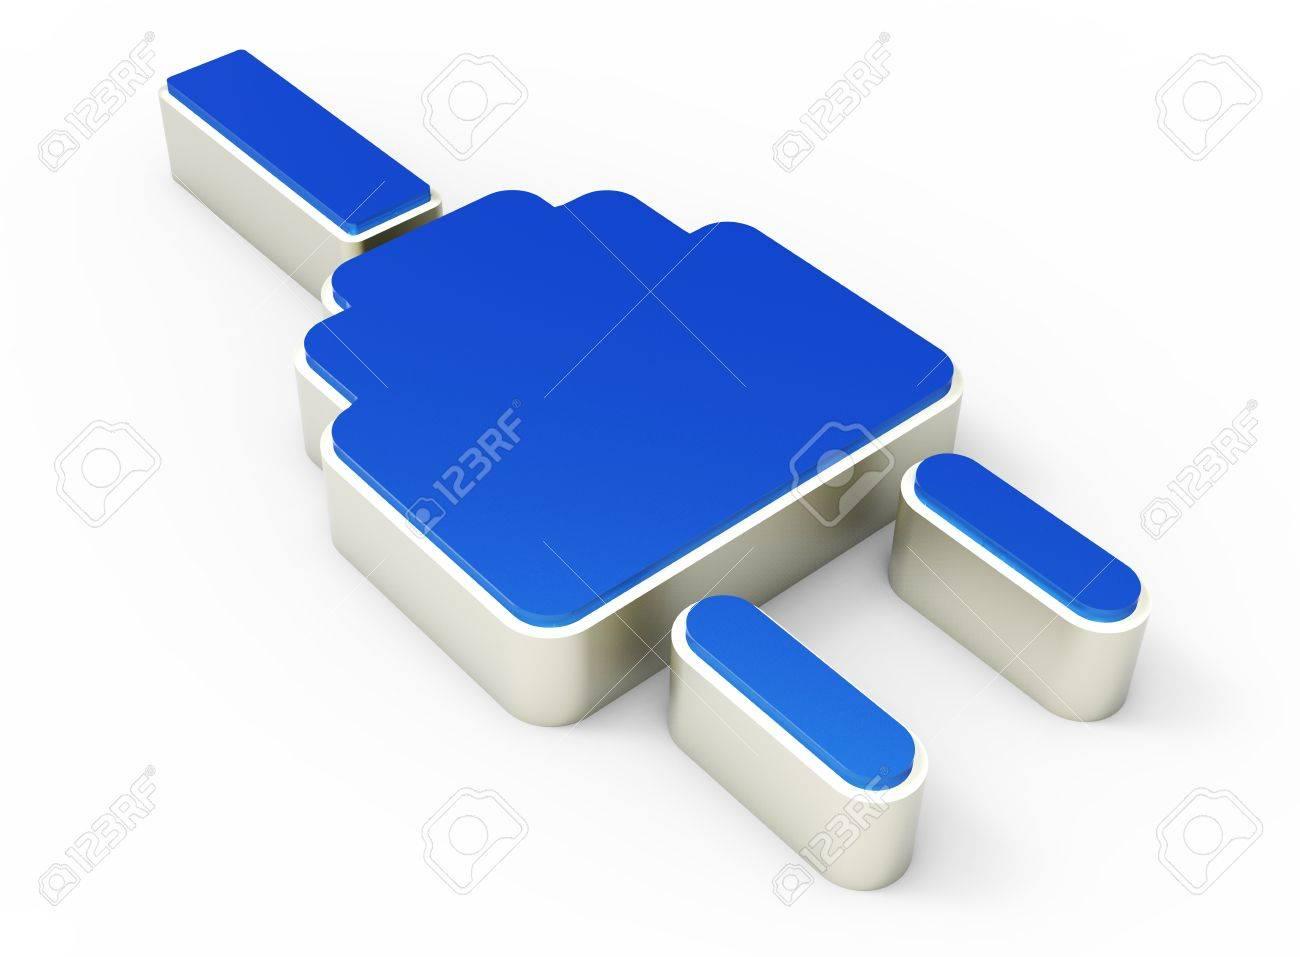 electric plug icon 3D Stock Photo - 17300500